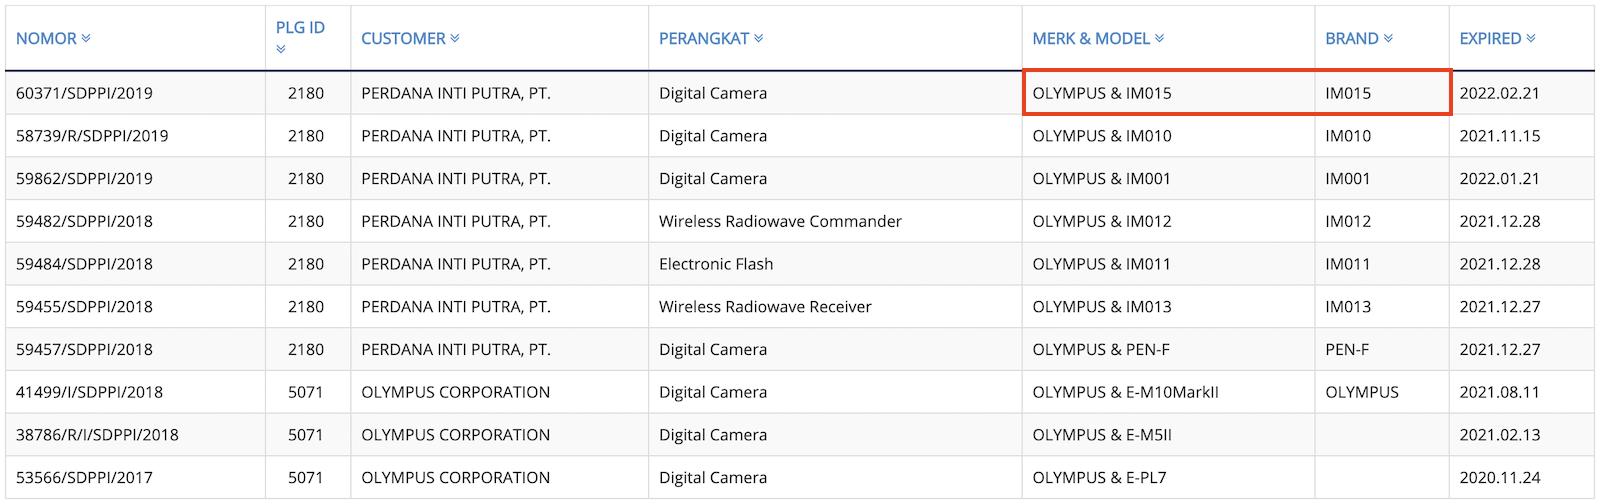 New Olympus camera IM015 registered online - Photo Rumors